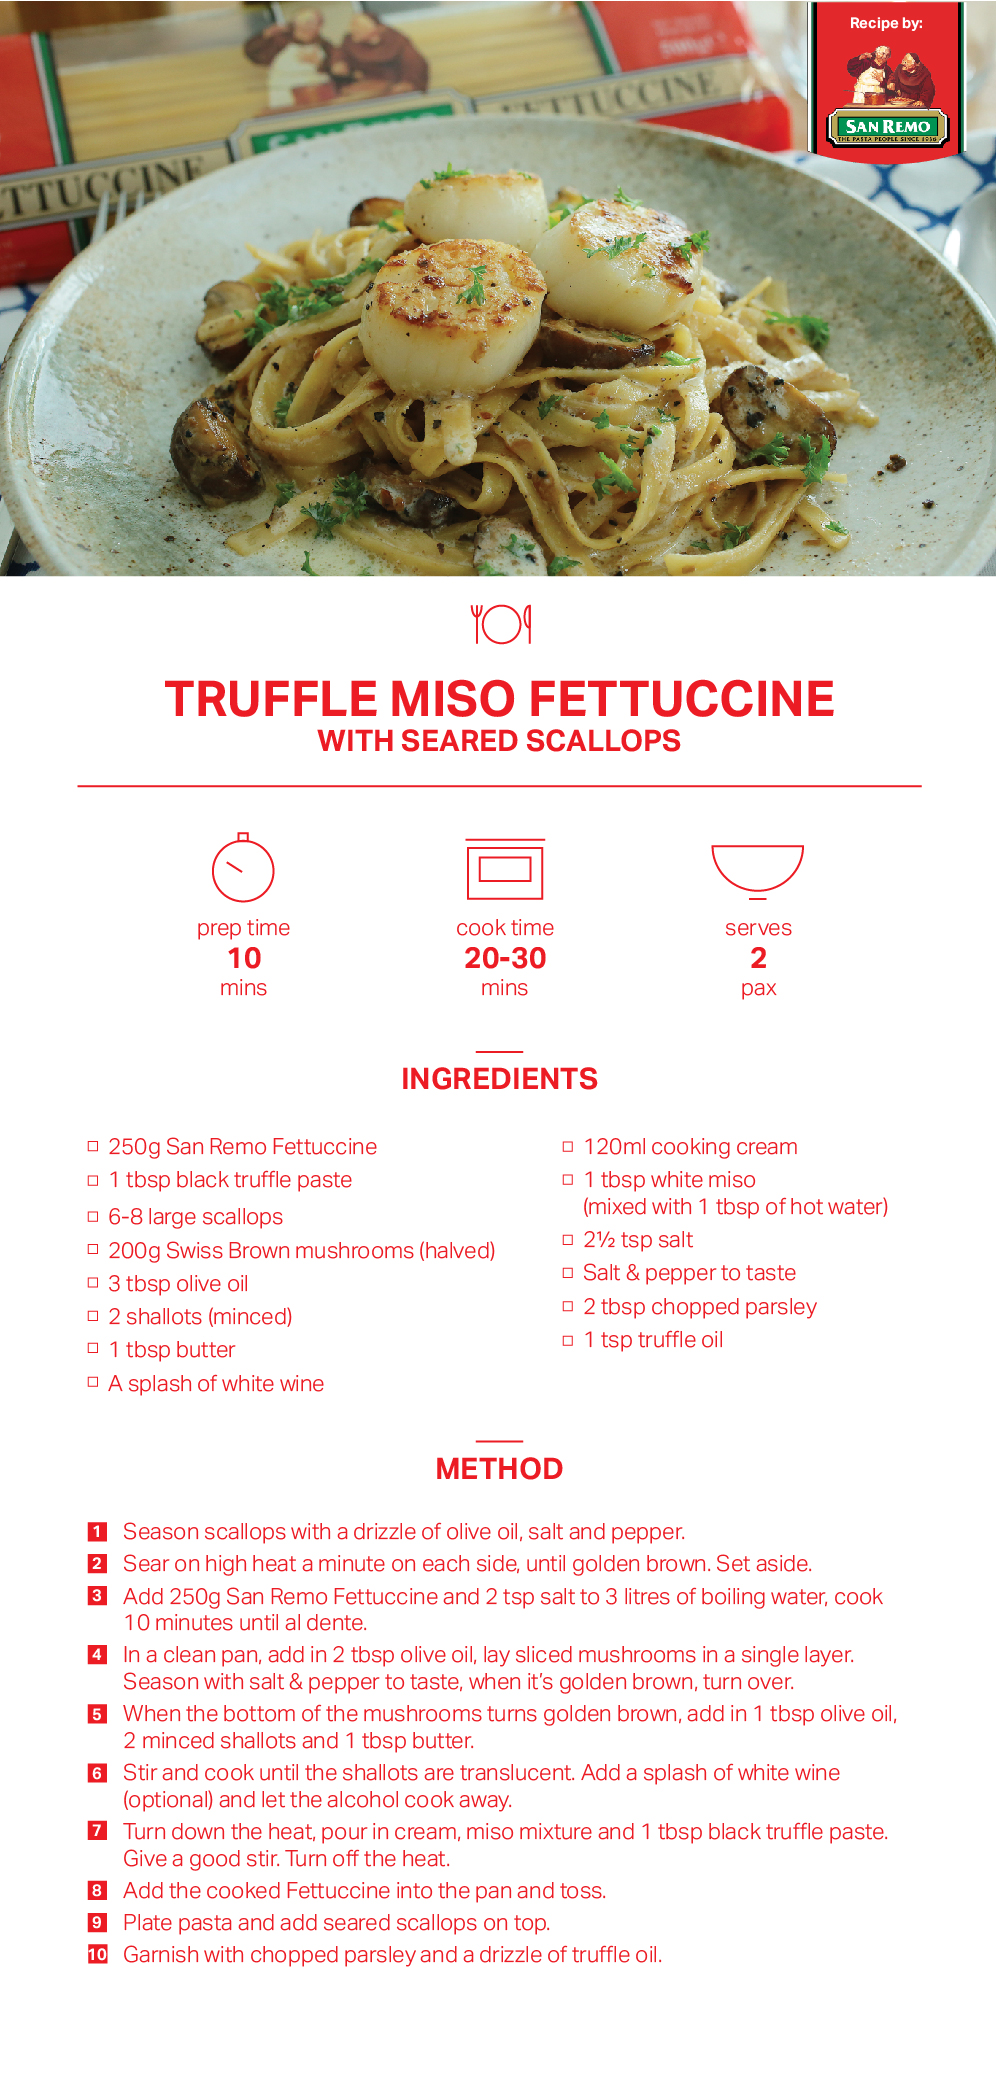 vday-recipe-truffle.jpg